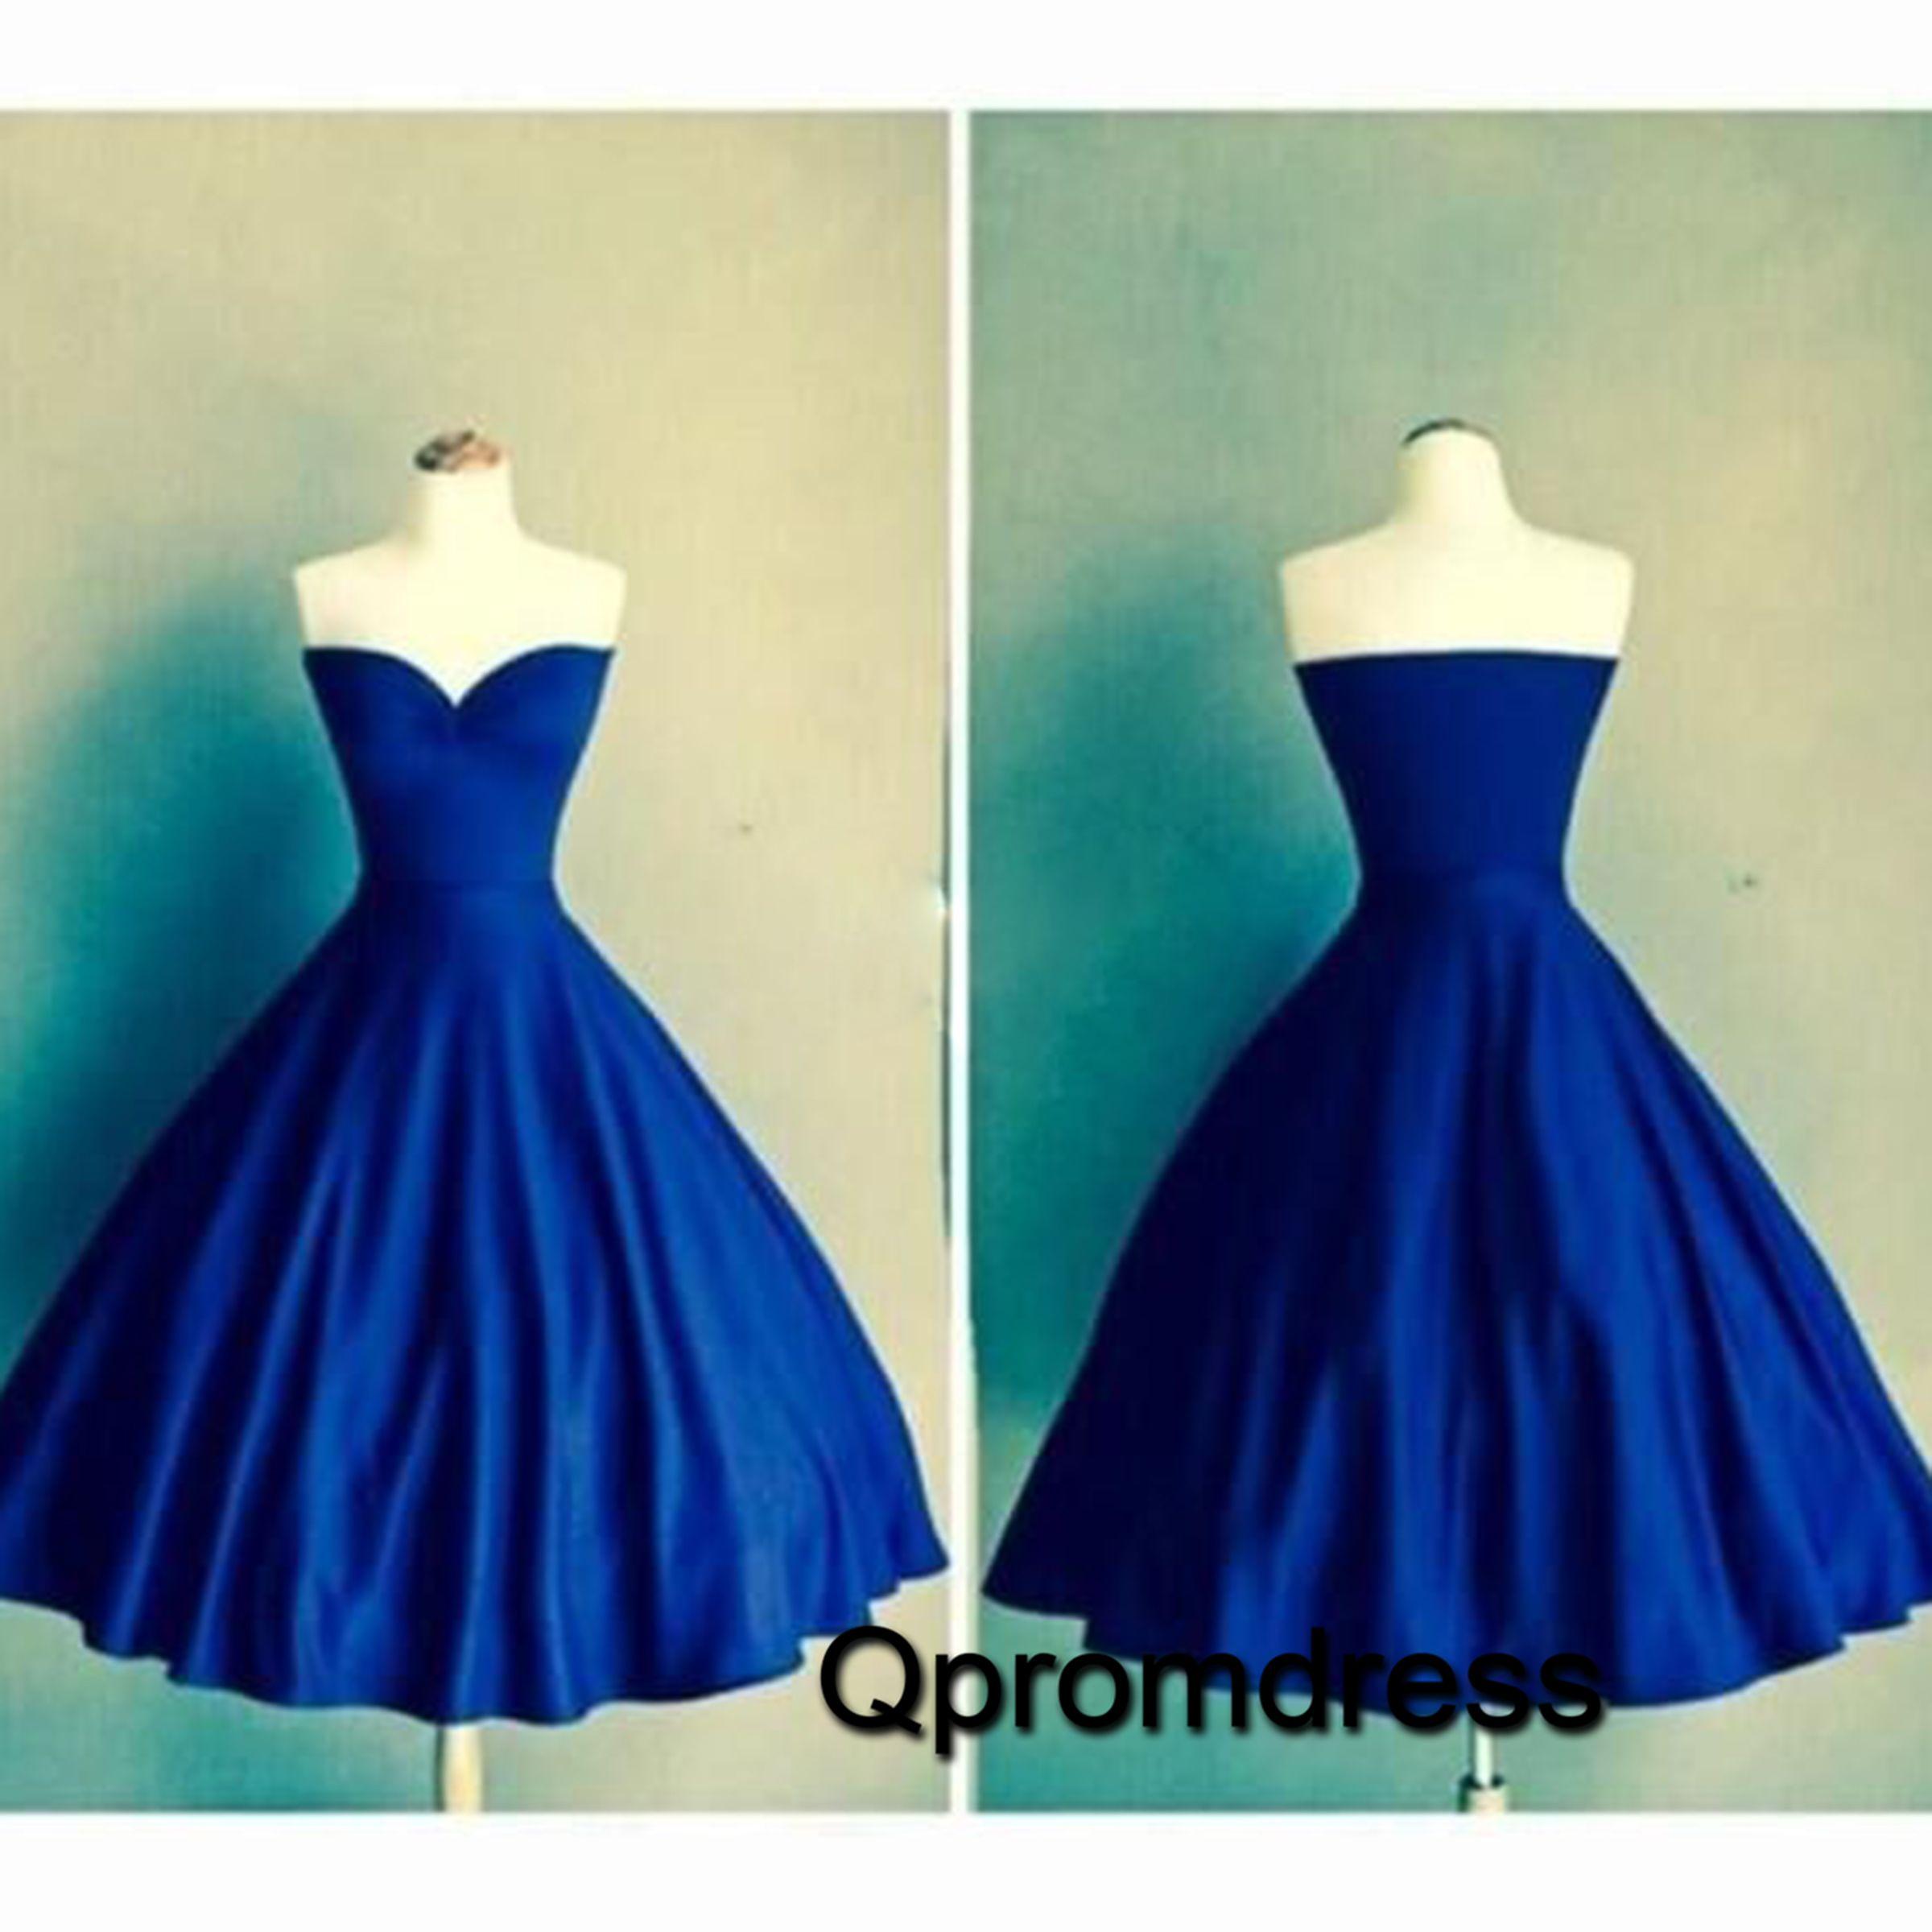 Cute navy blue satin sweetheart dress for prom 2016, bridal dress ...